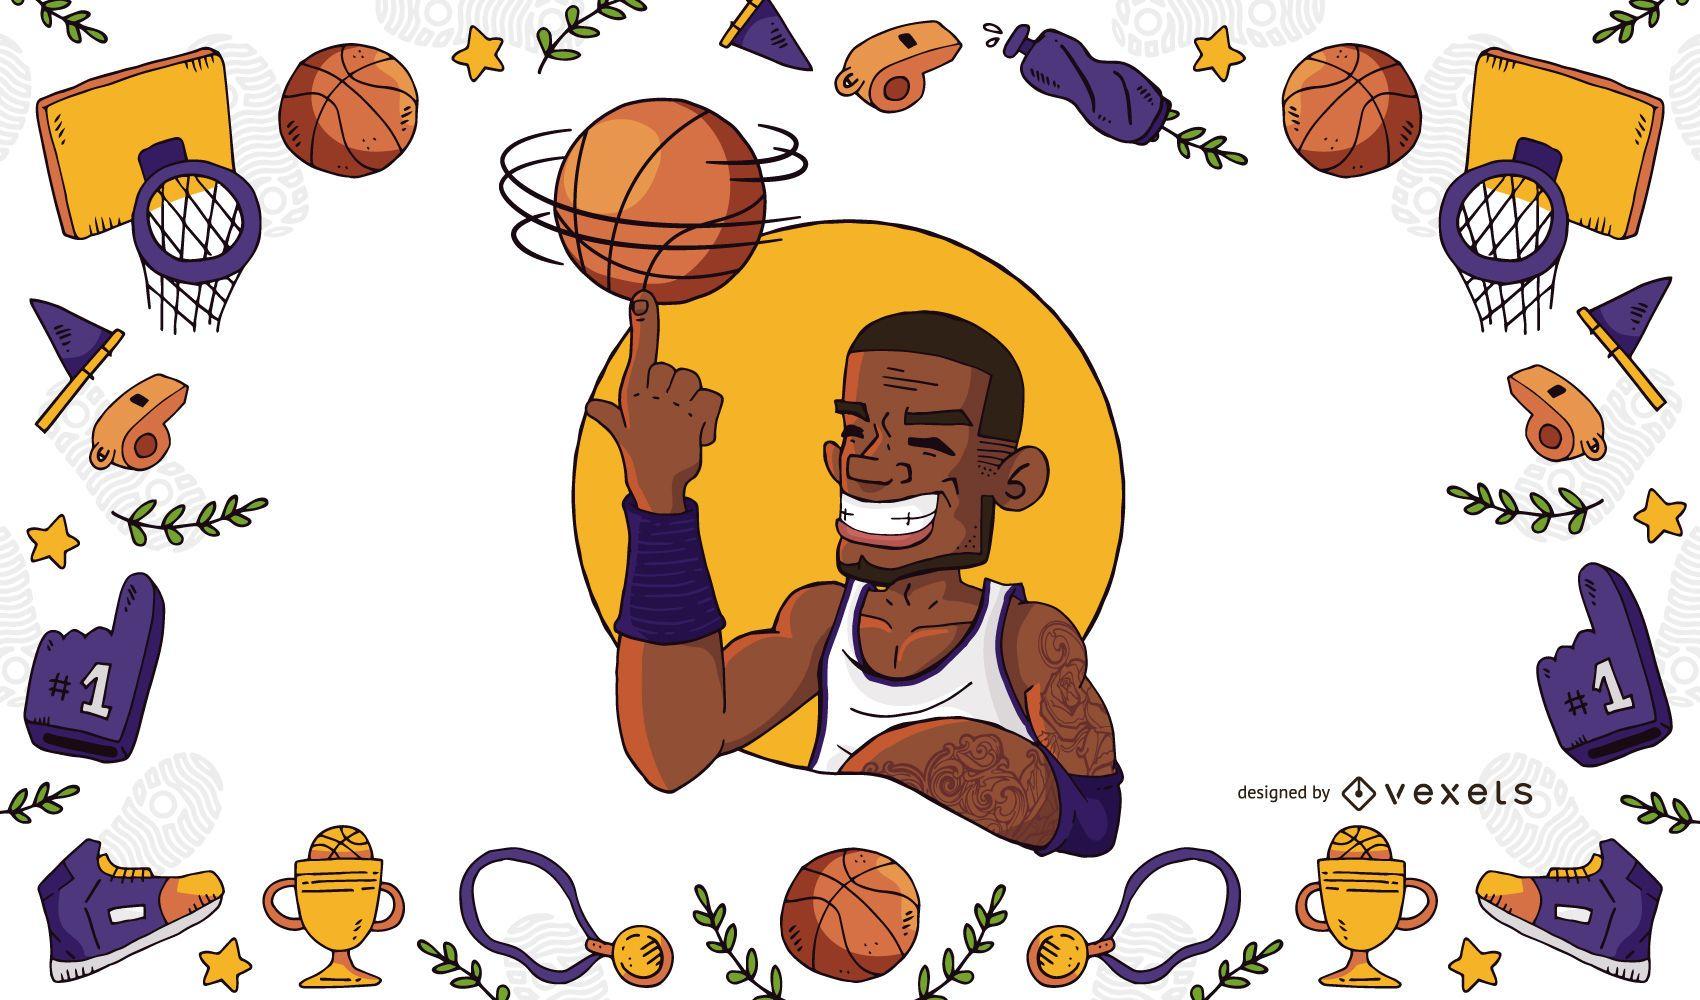 Basketball player illustration and frame